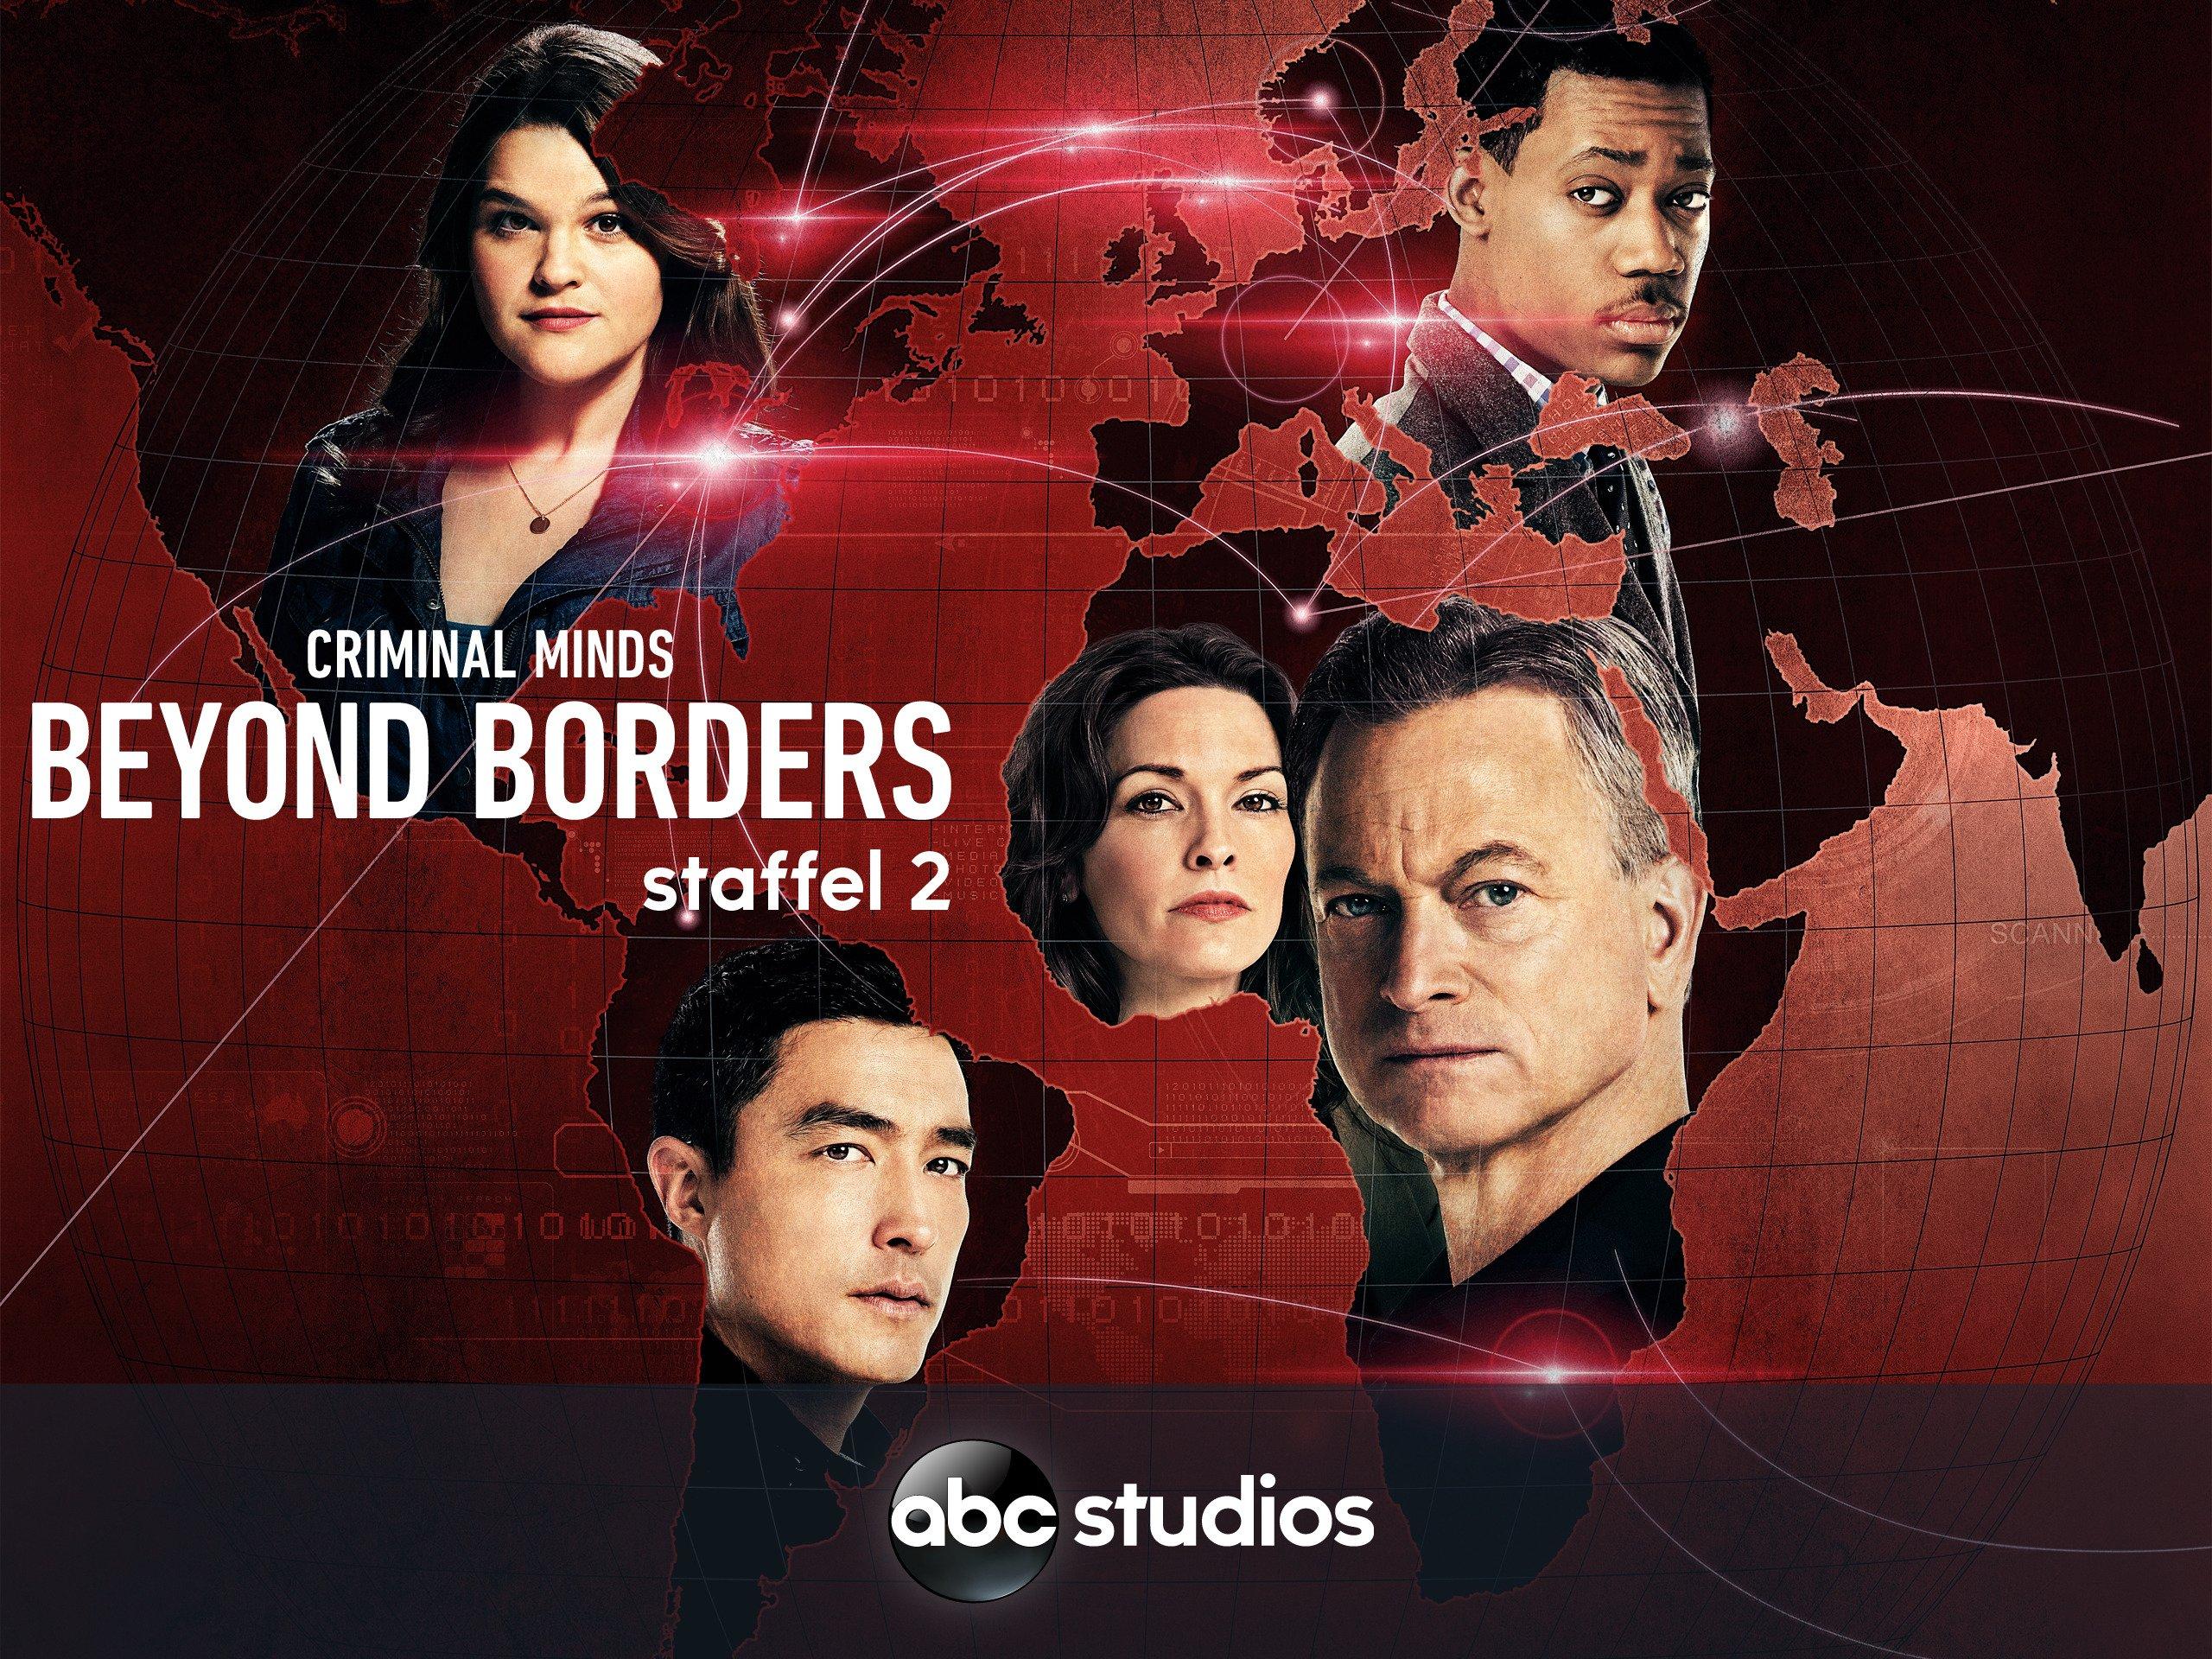 Criminal Minds: Beyond Borders - Season 2